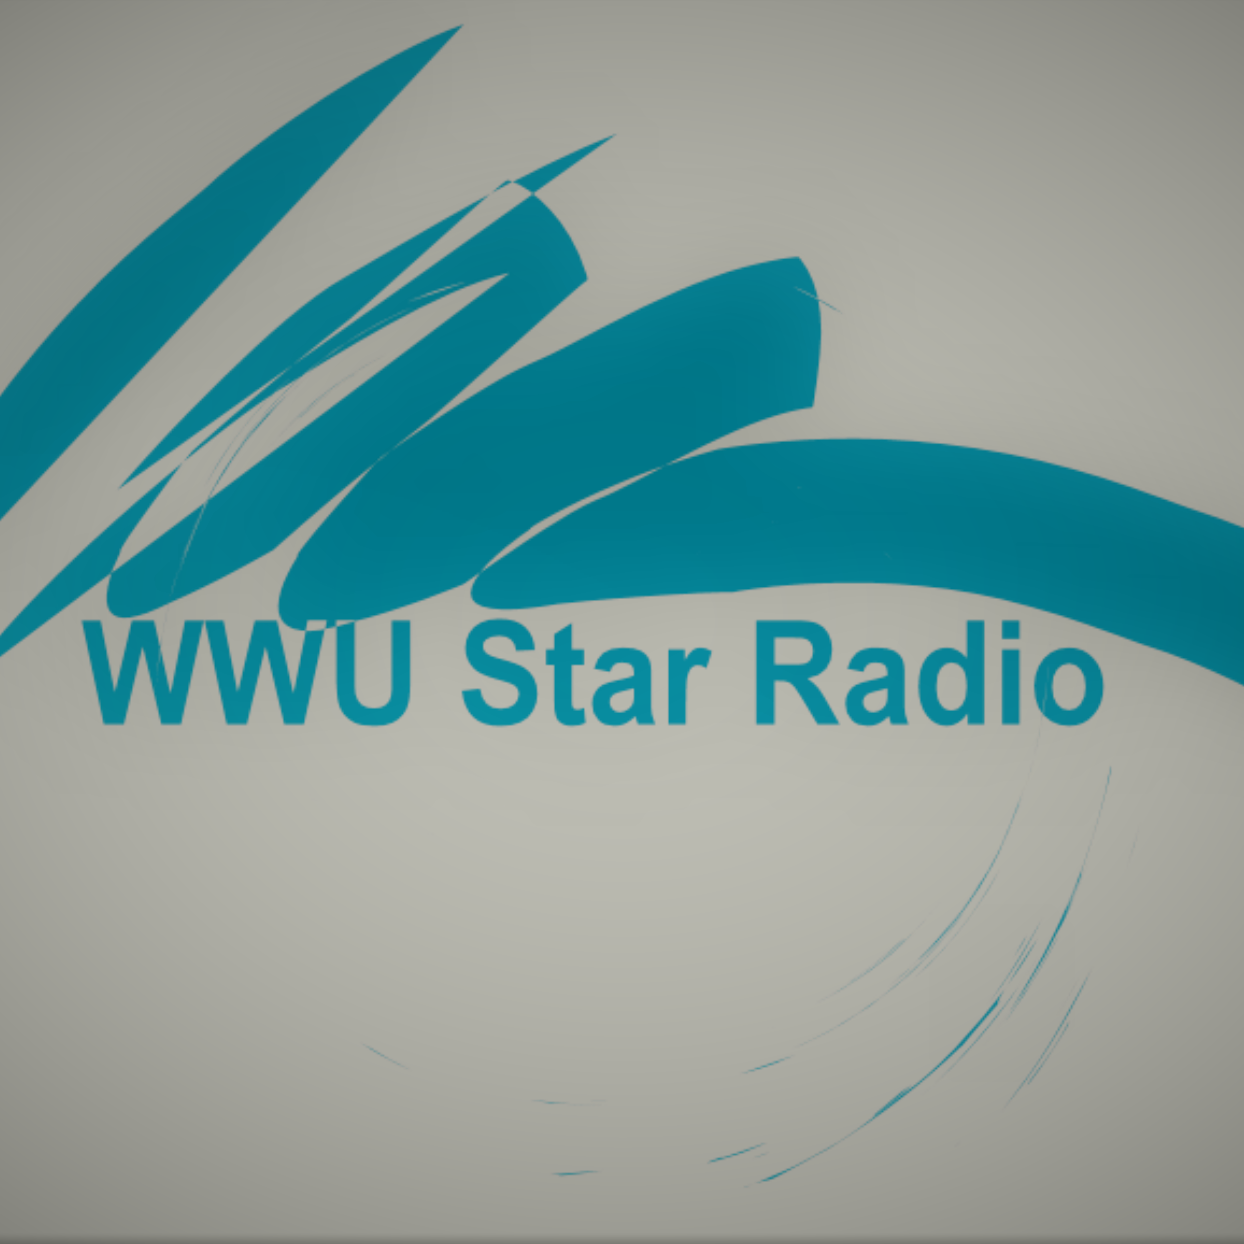 WWU Star Radio